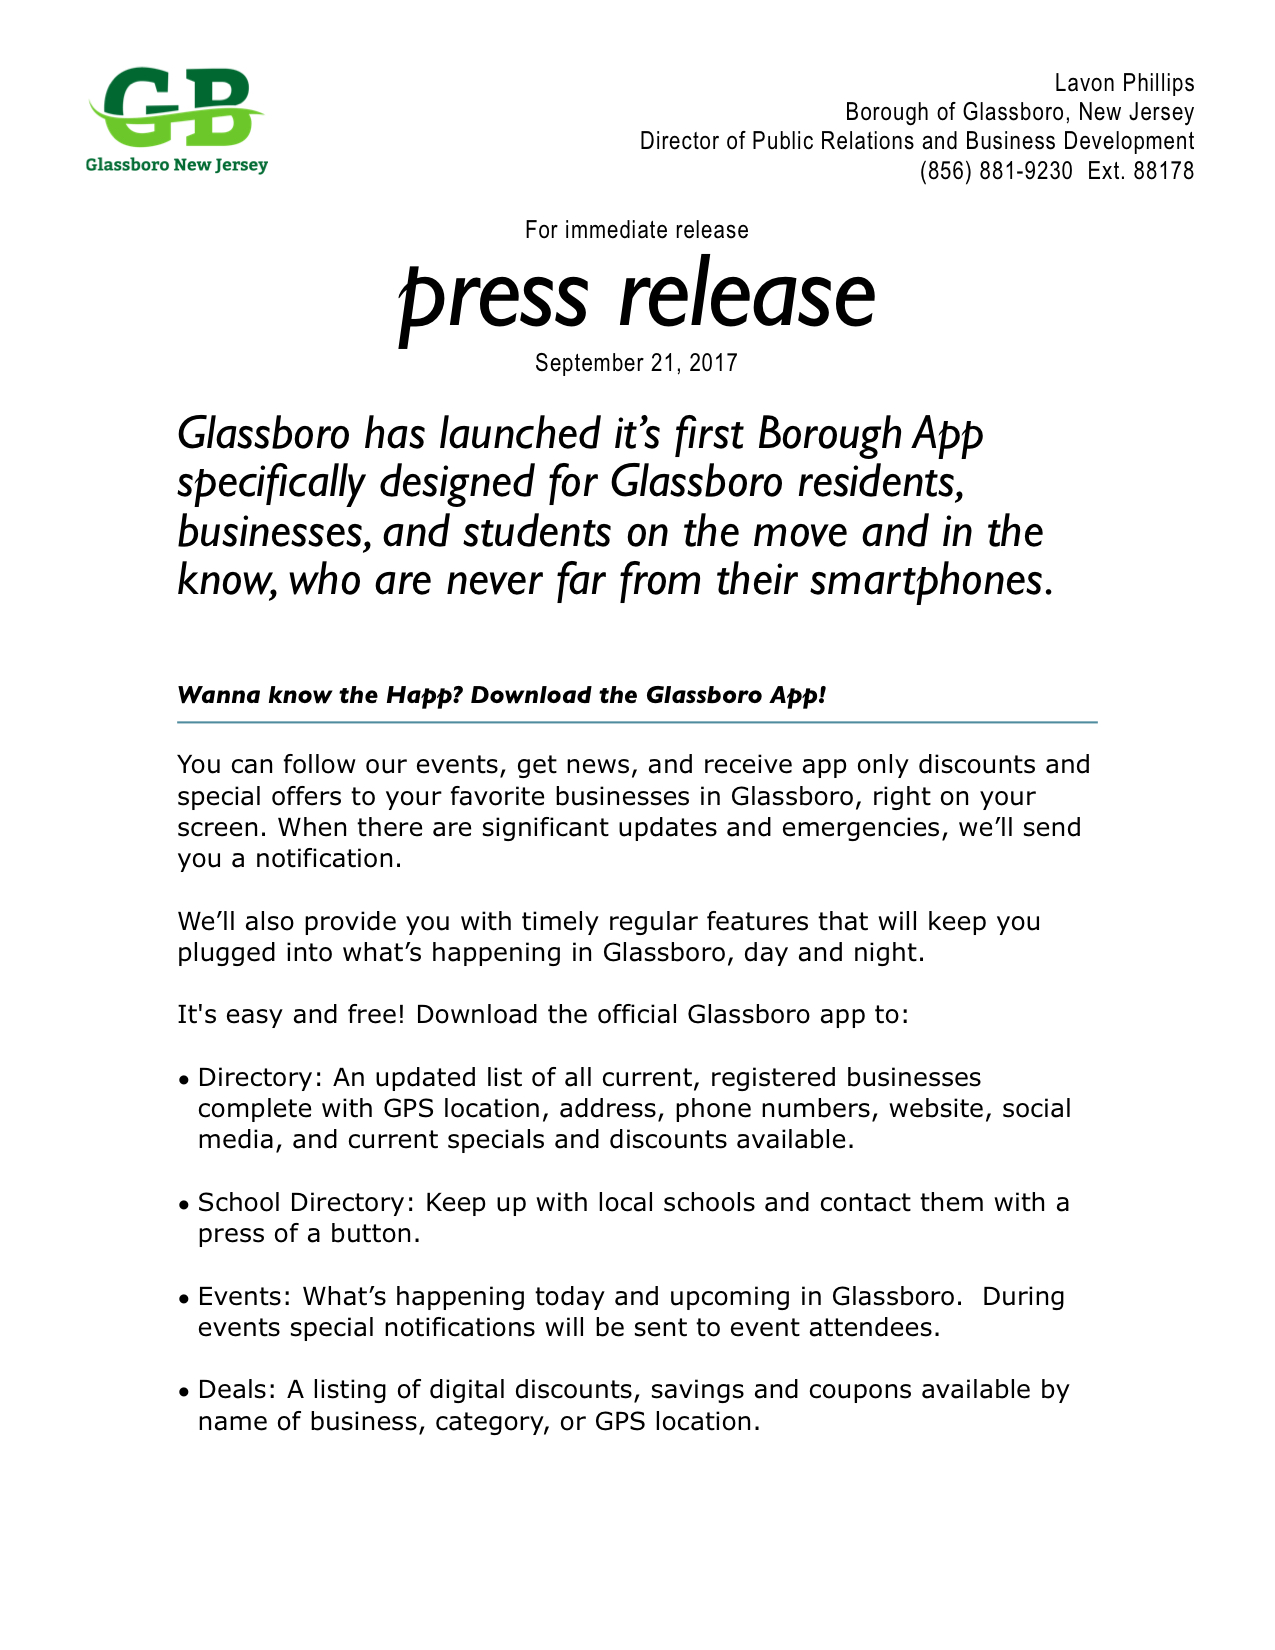 PRESS RELEASE: Glassboro announces it first Borough App  copy.jpeg